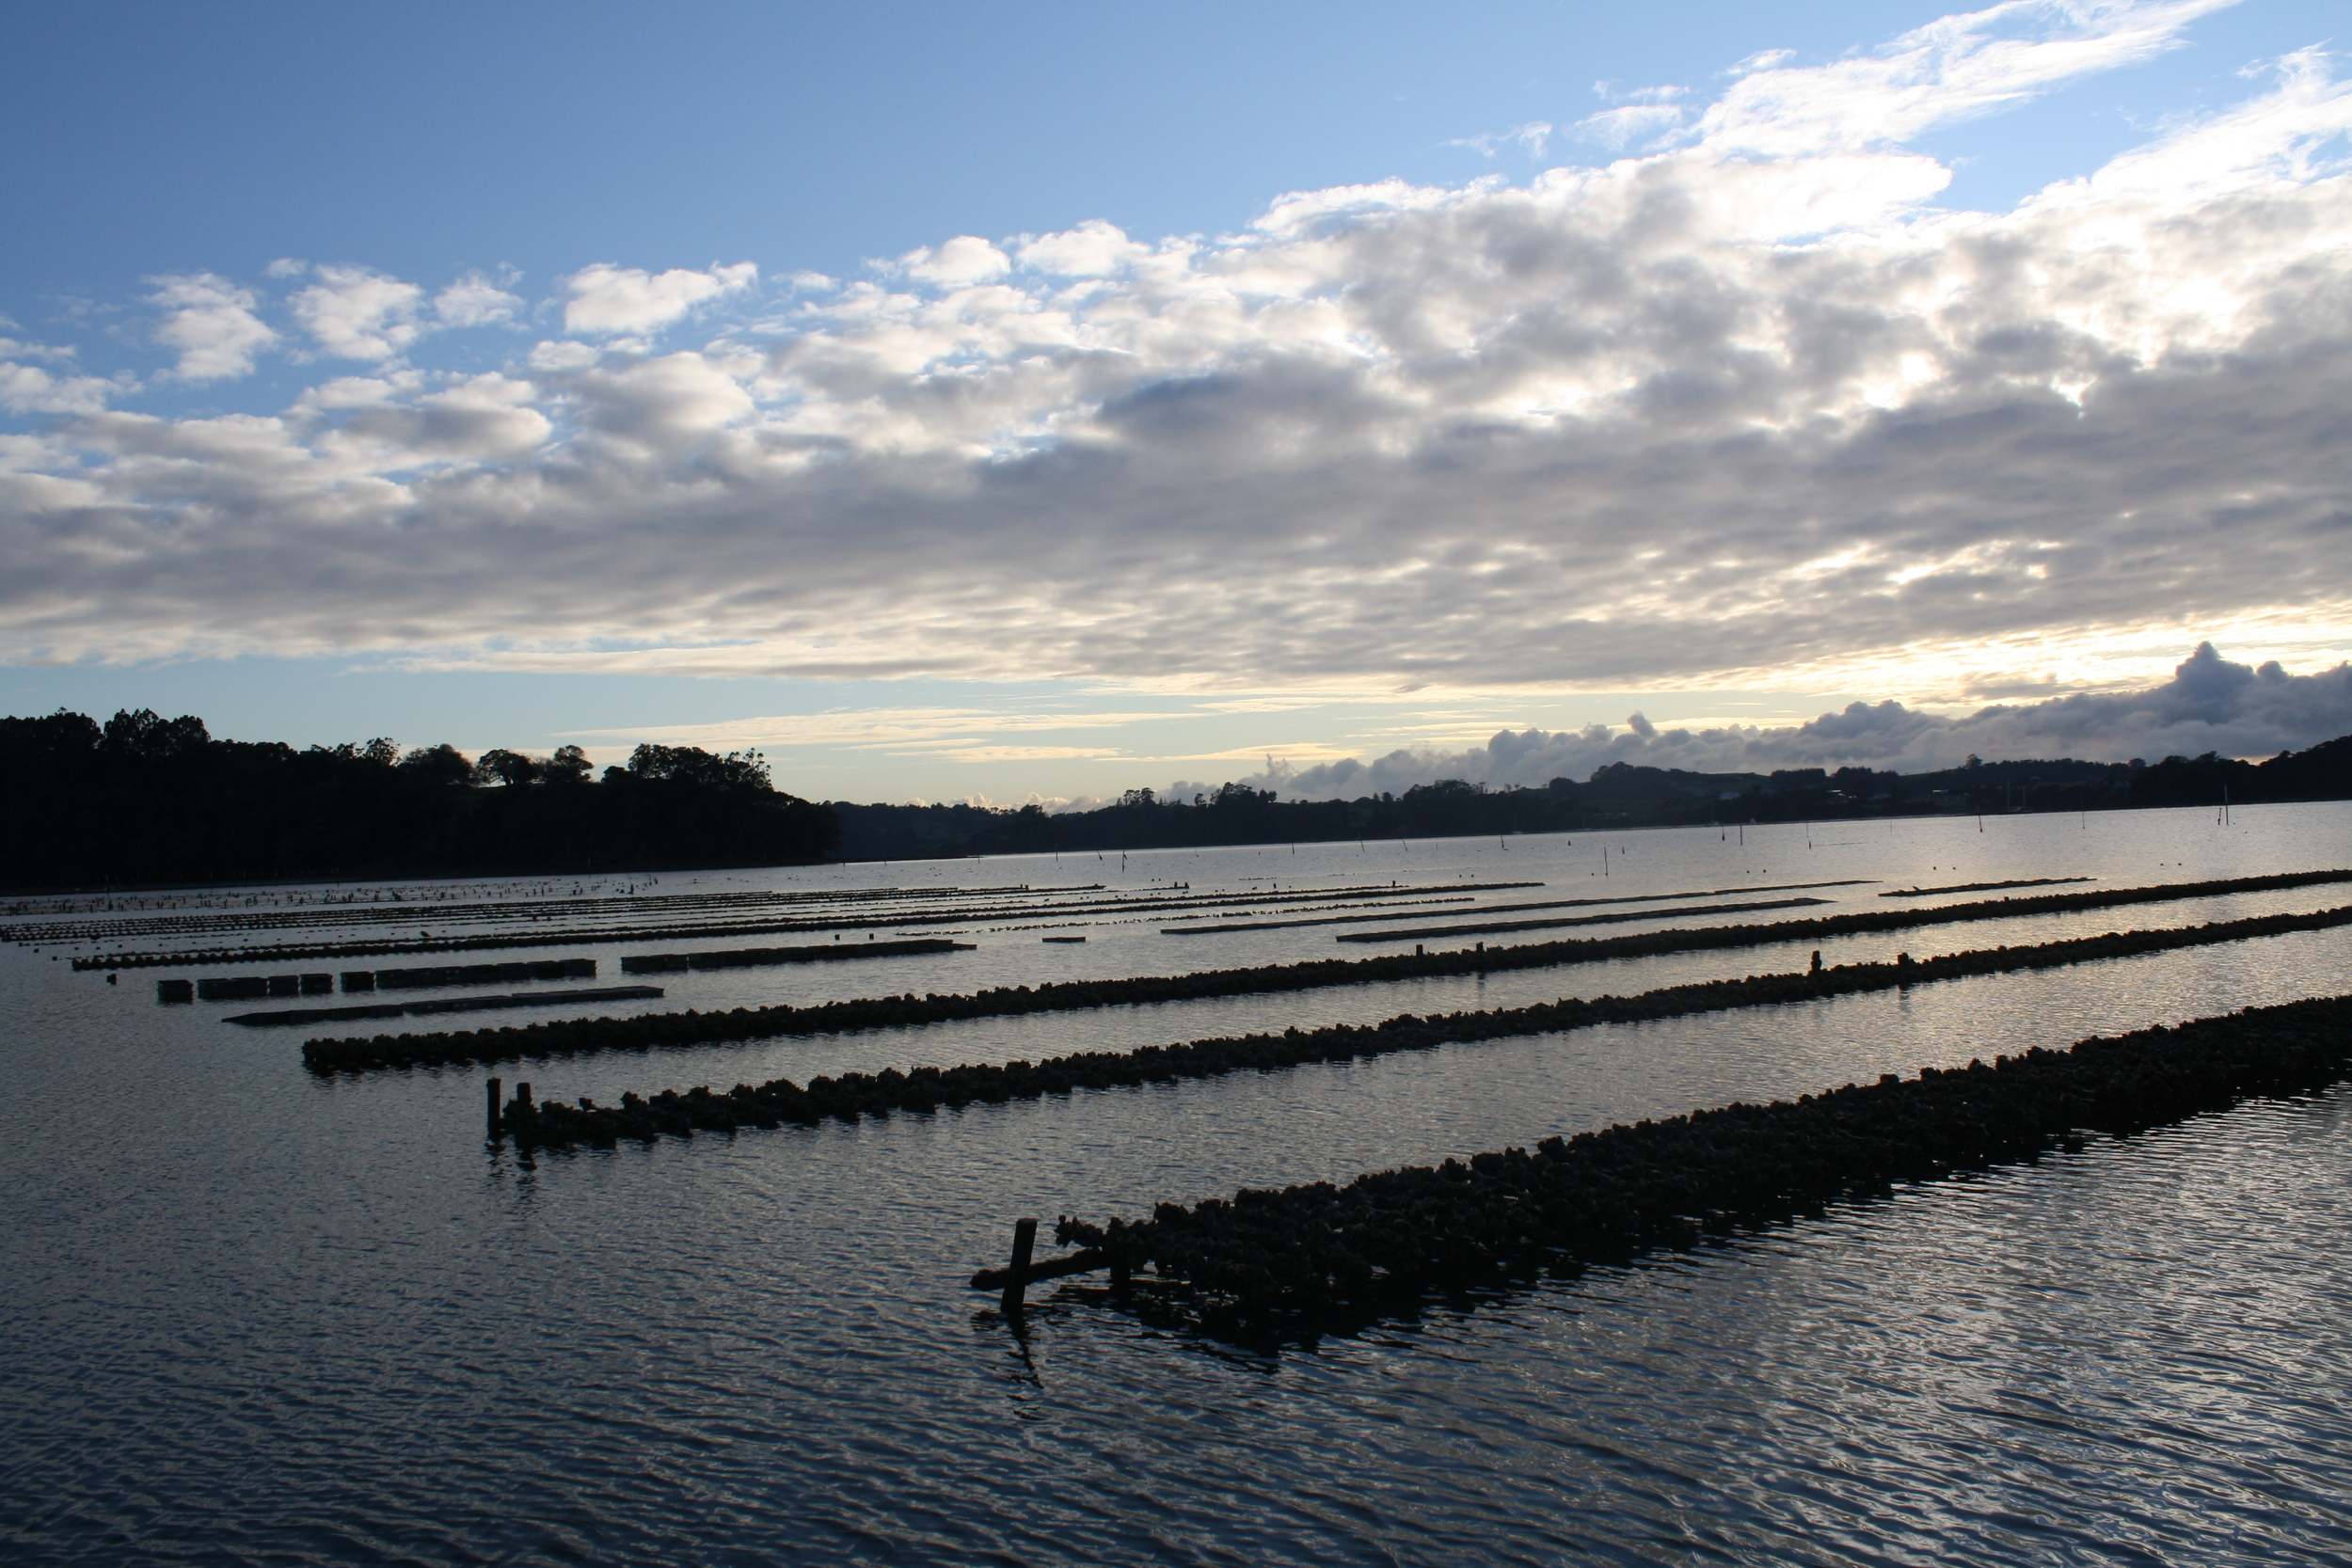 Oyster farm in the Mahurangi estuary